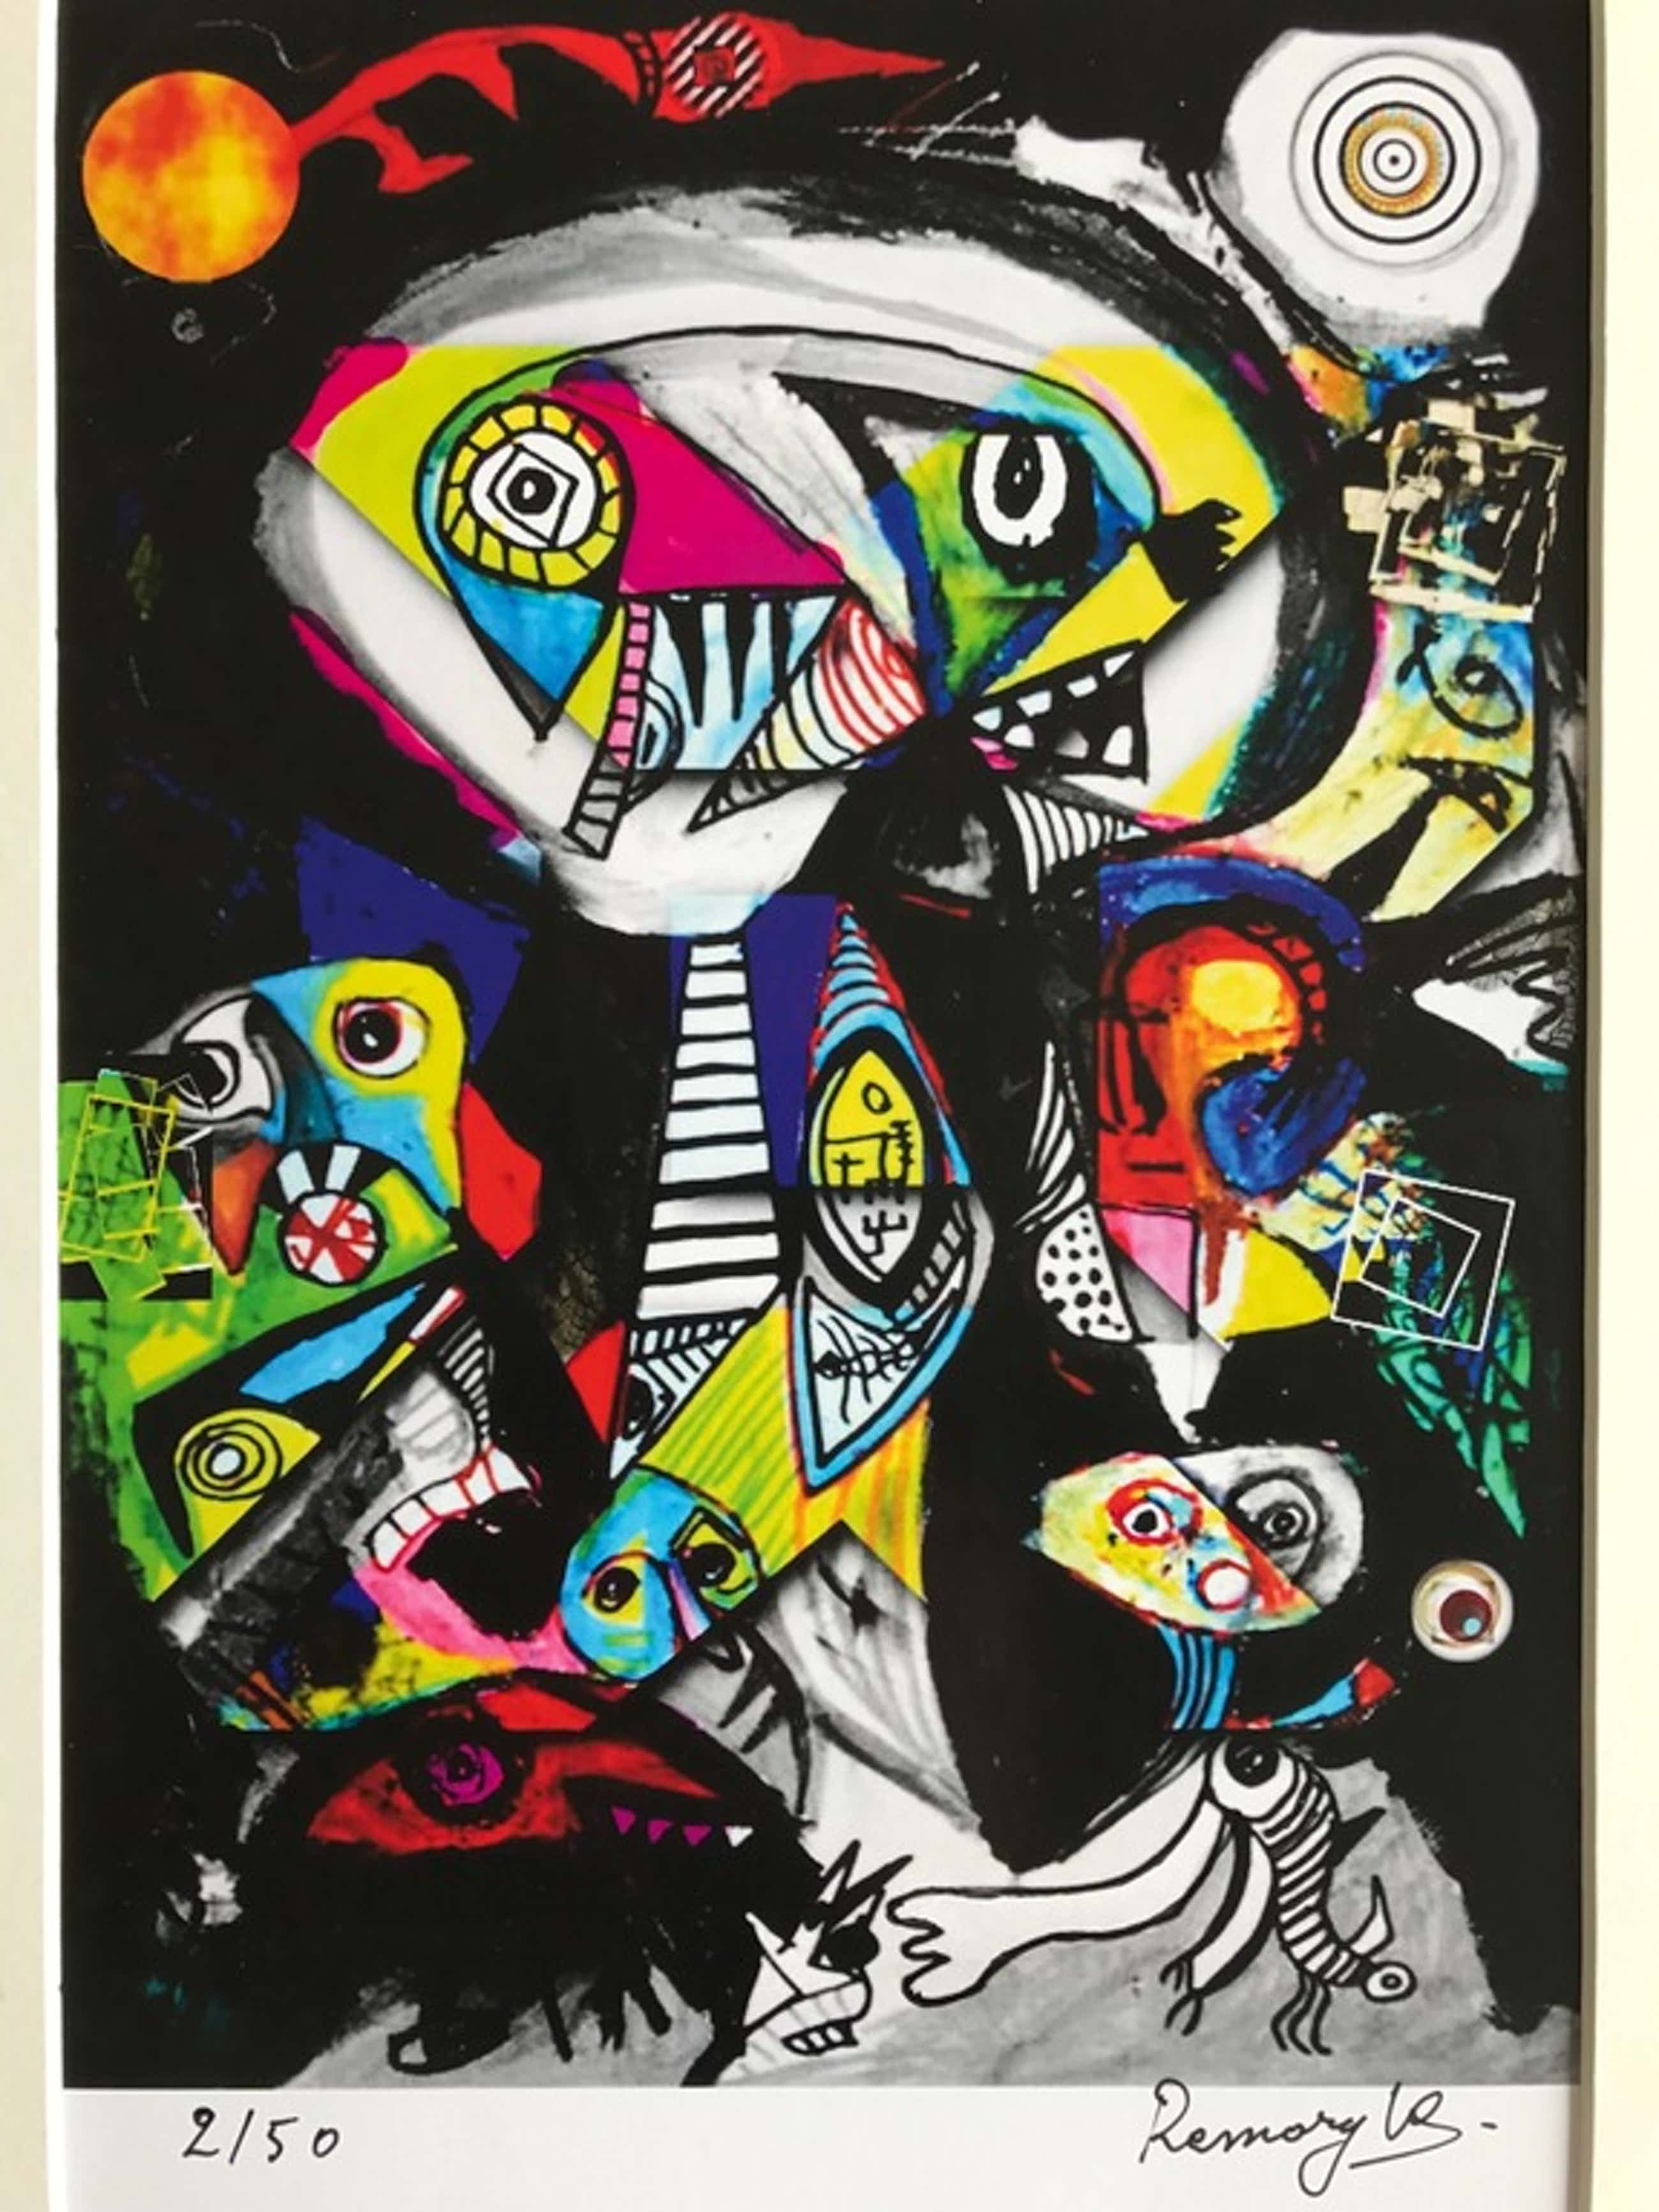 William Remory - Art Print - Gesigneerd - Oplage van 50 kopen? Bied vanaf 45!